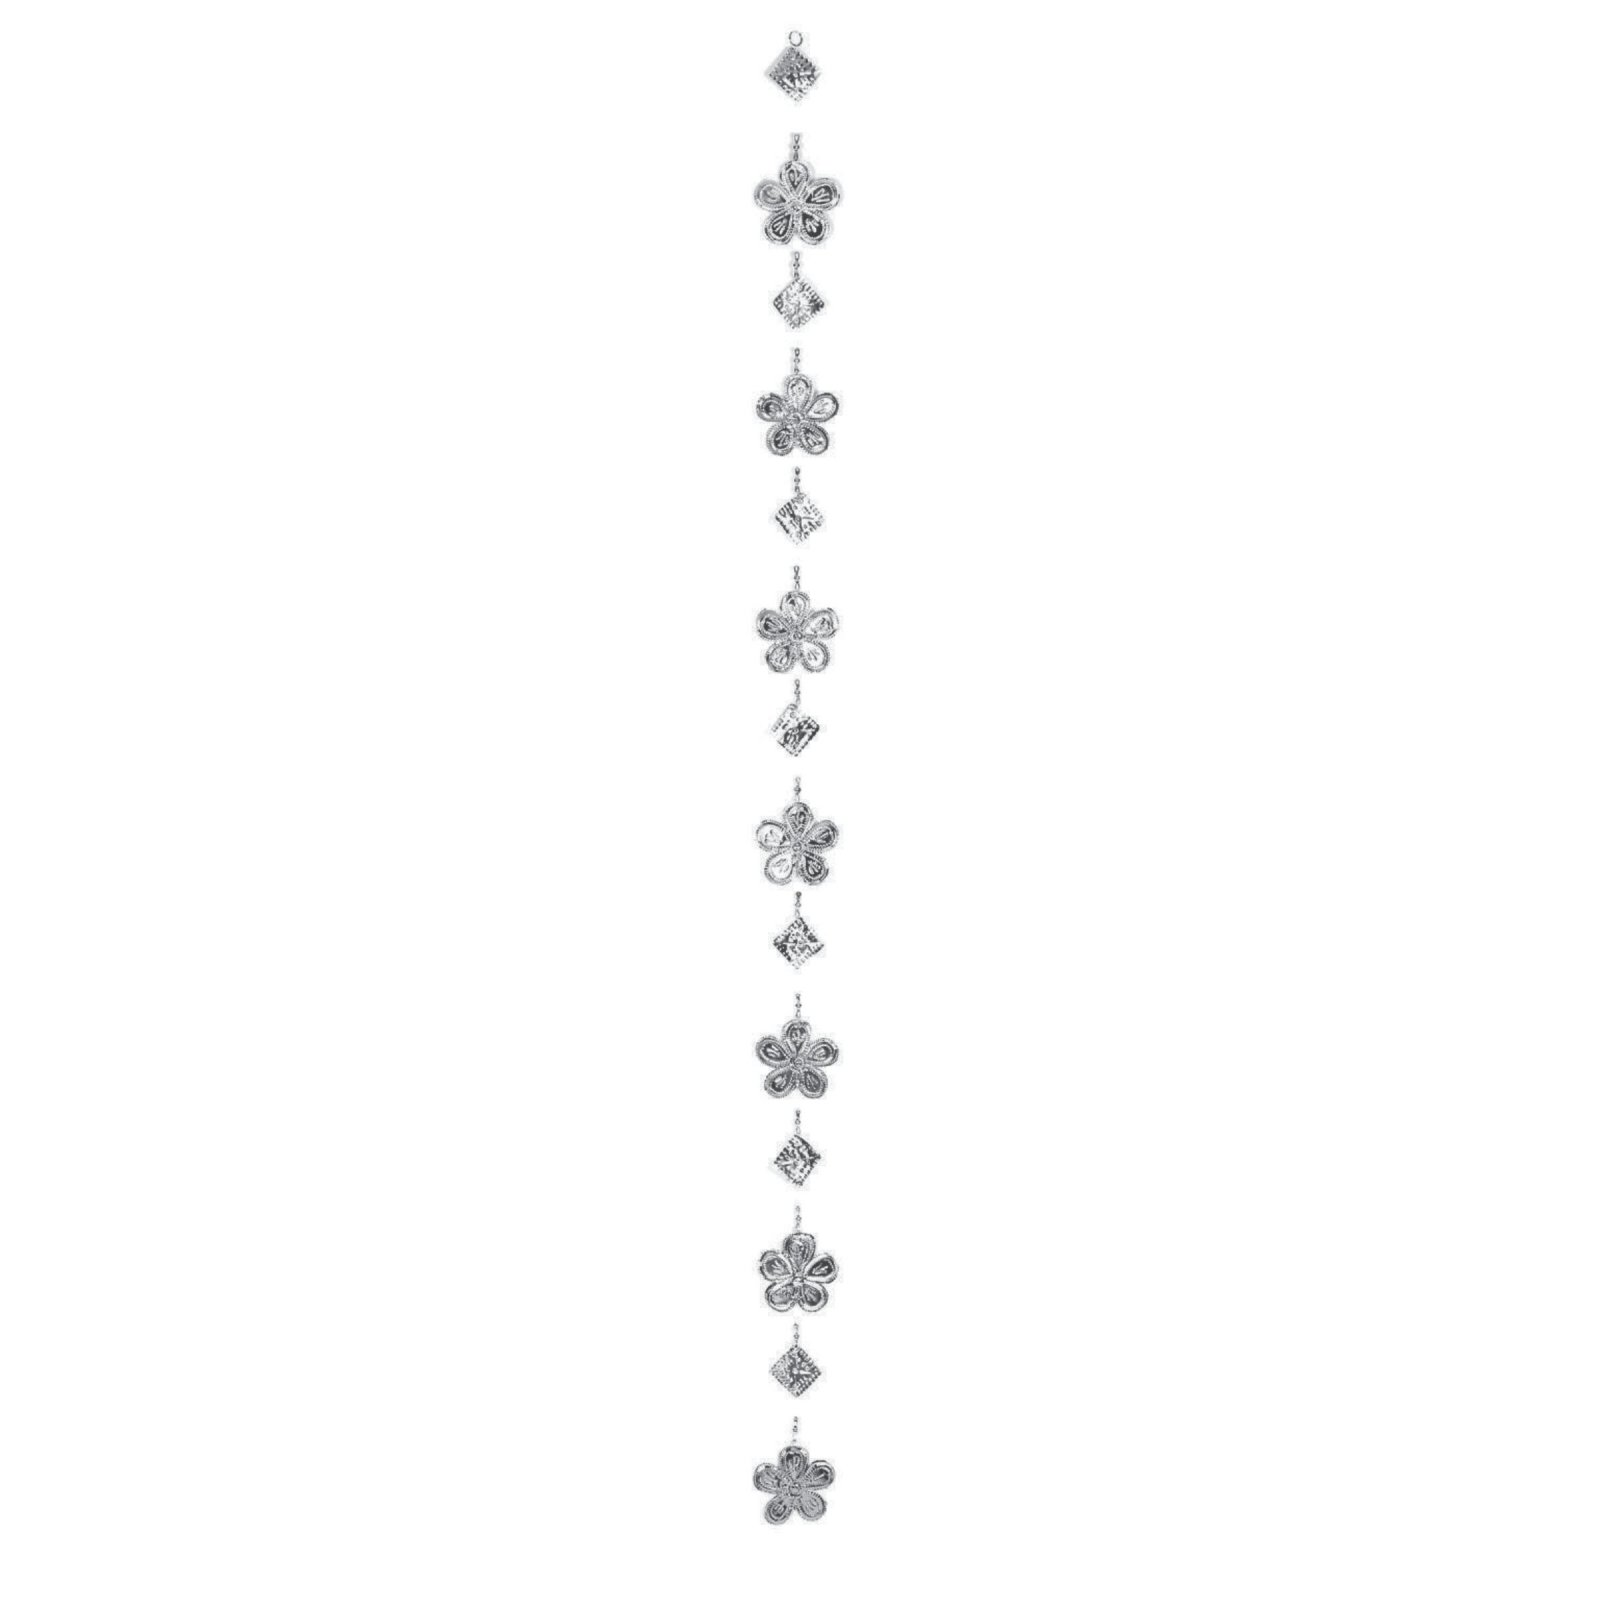 Tin Ornament Strands